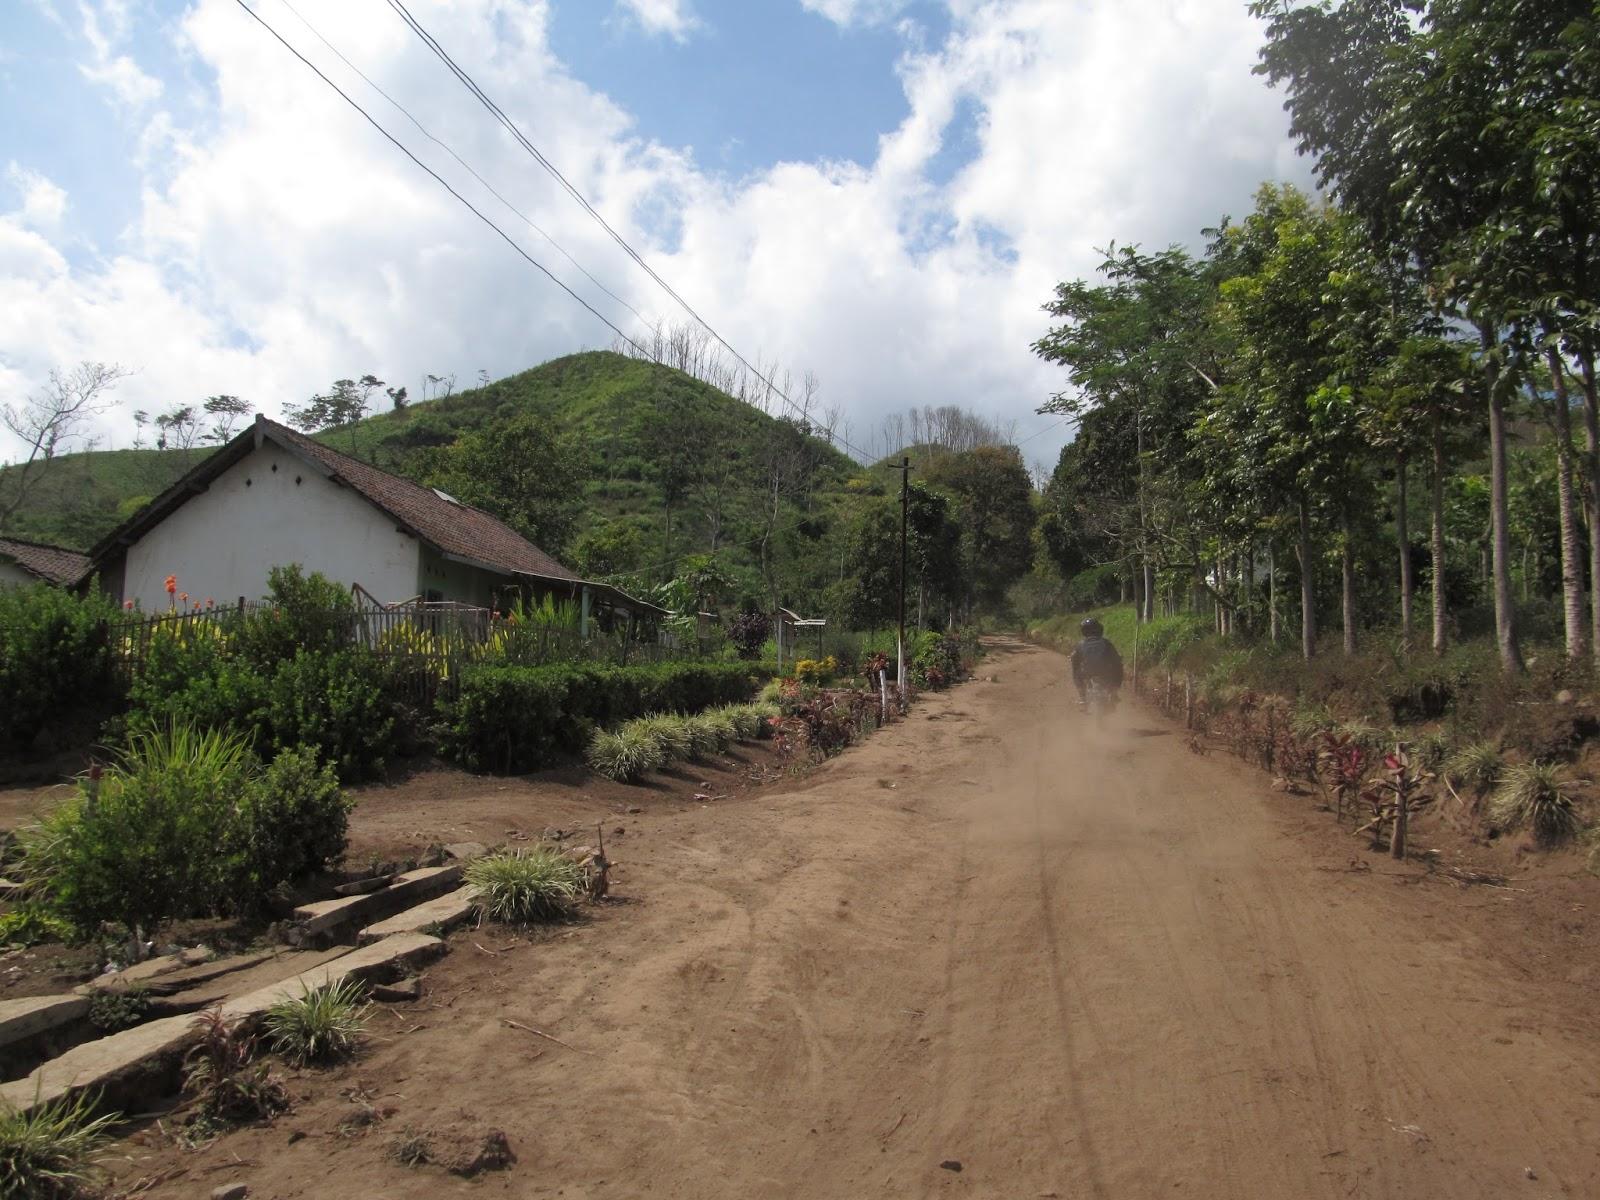 Taman Galuh Surga Tersembunyi Kaki Gunung Crengih Berita Bondowoso Jalan